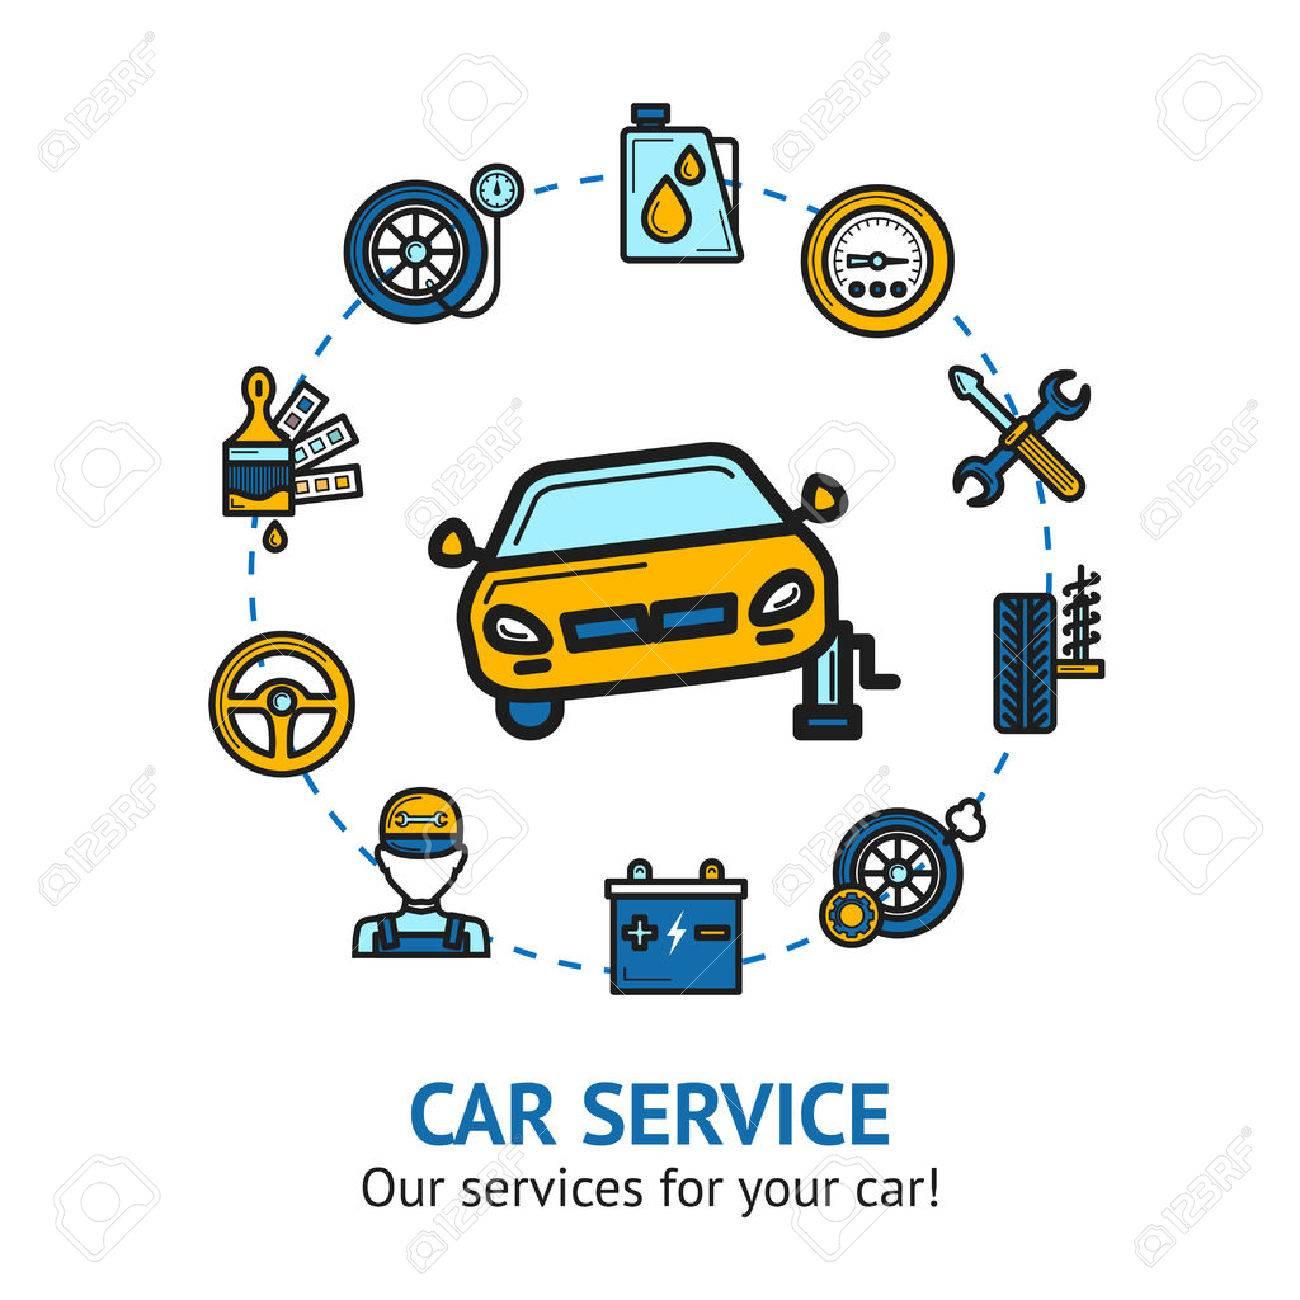 Car Repair And Maintenance >> Car Service Concept With Auto Repair And Maintenance Decorative